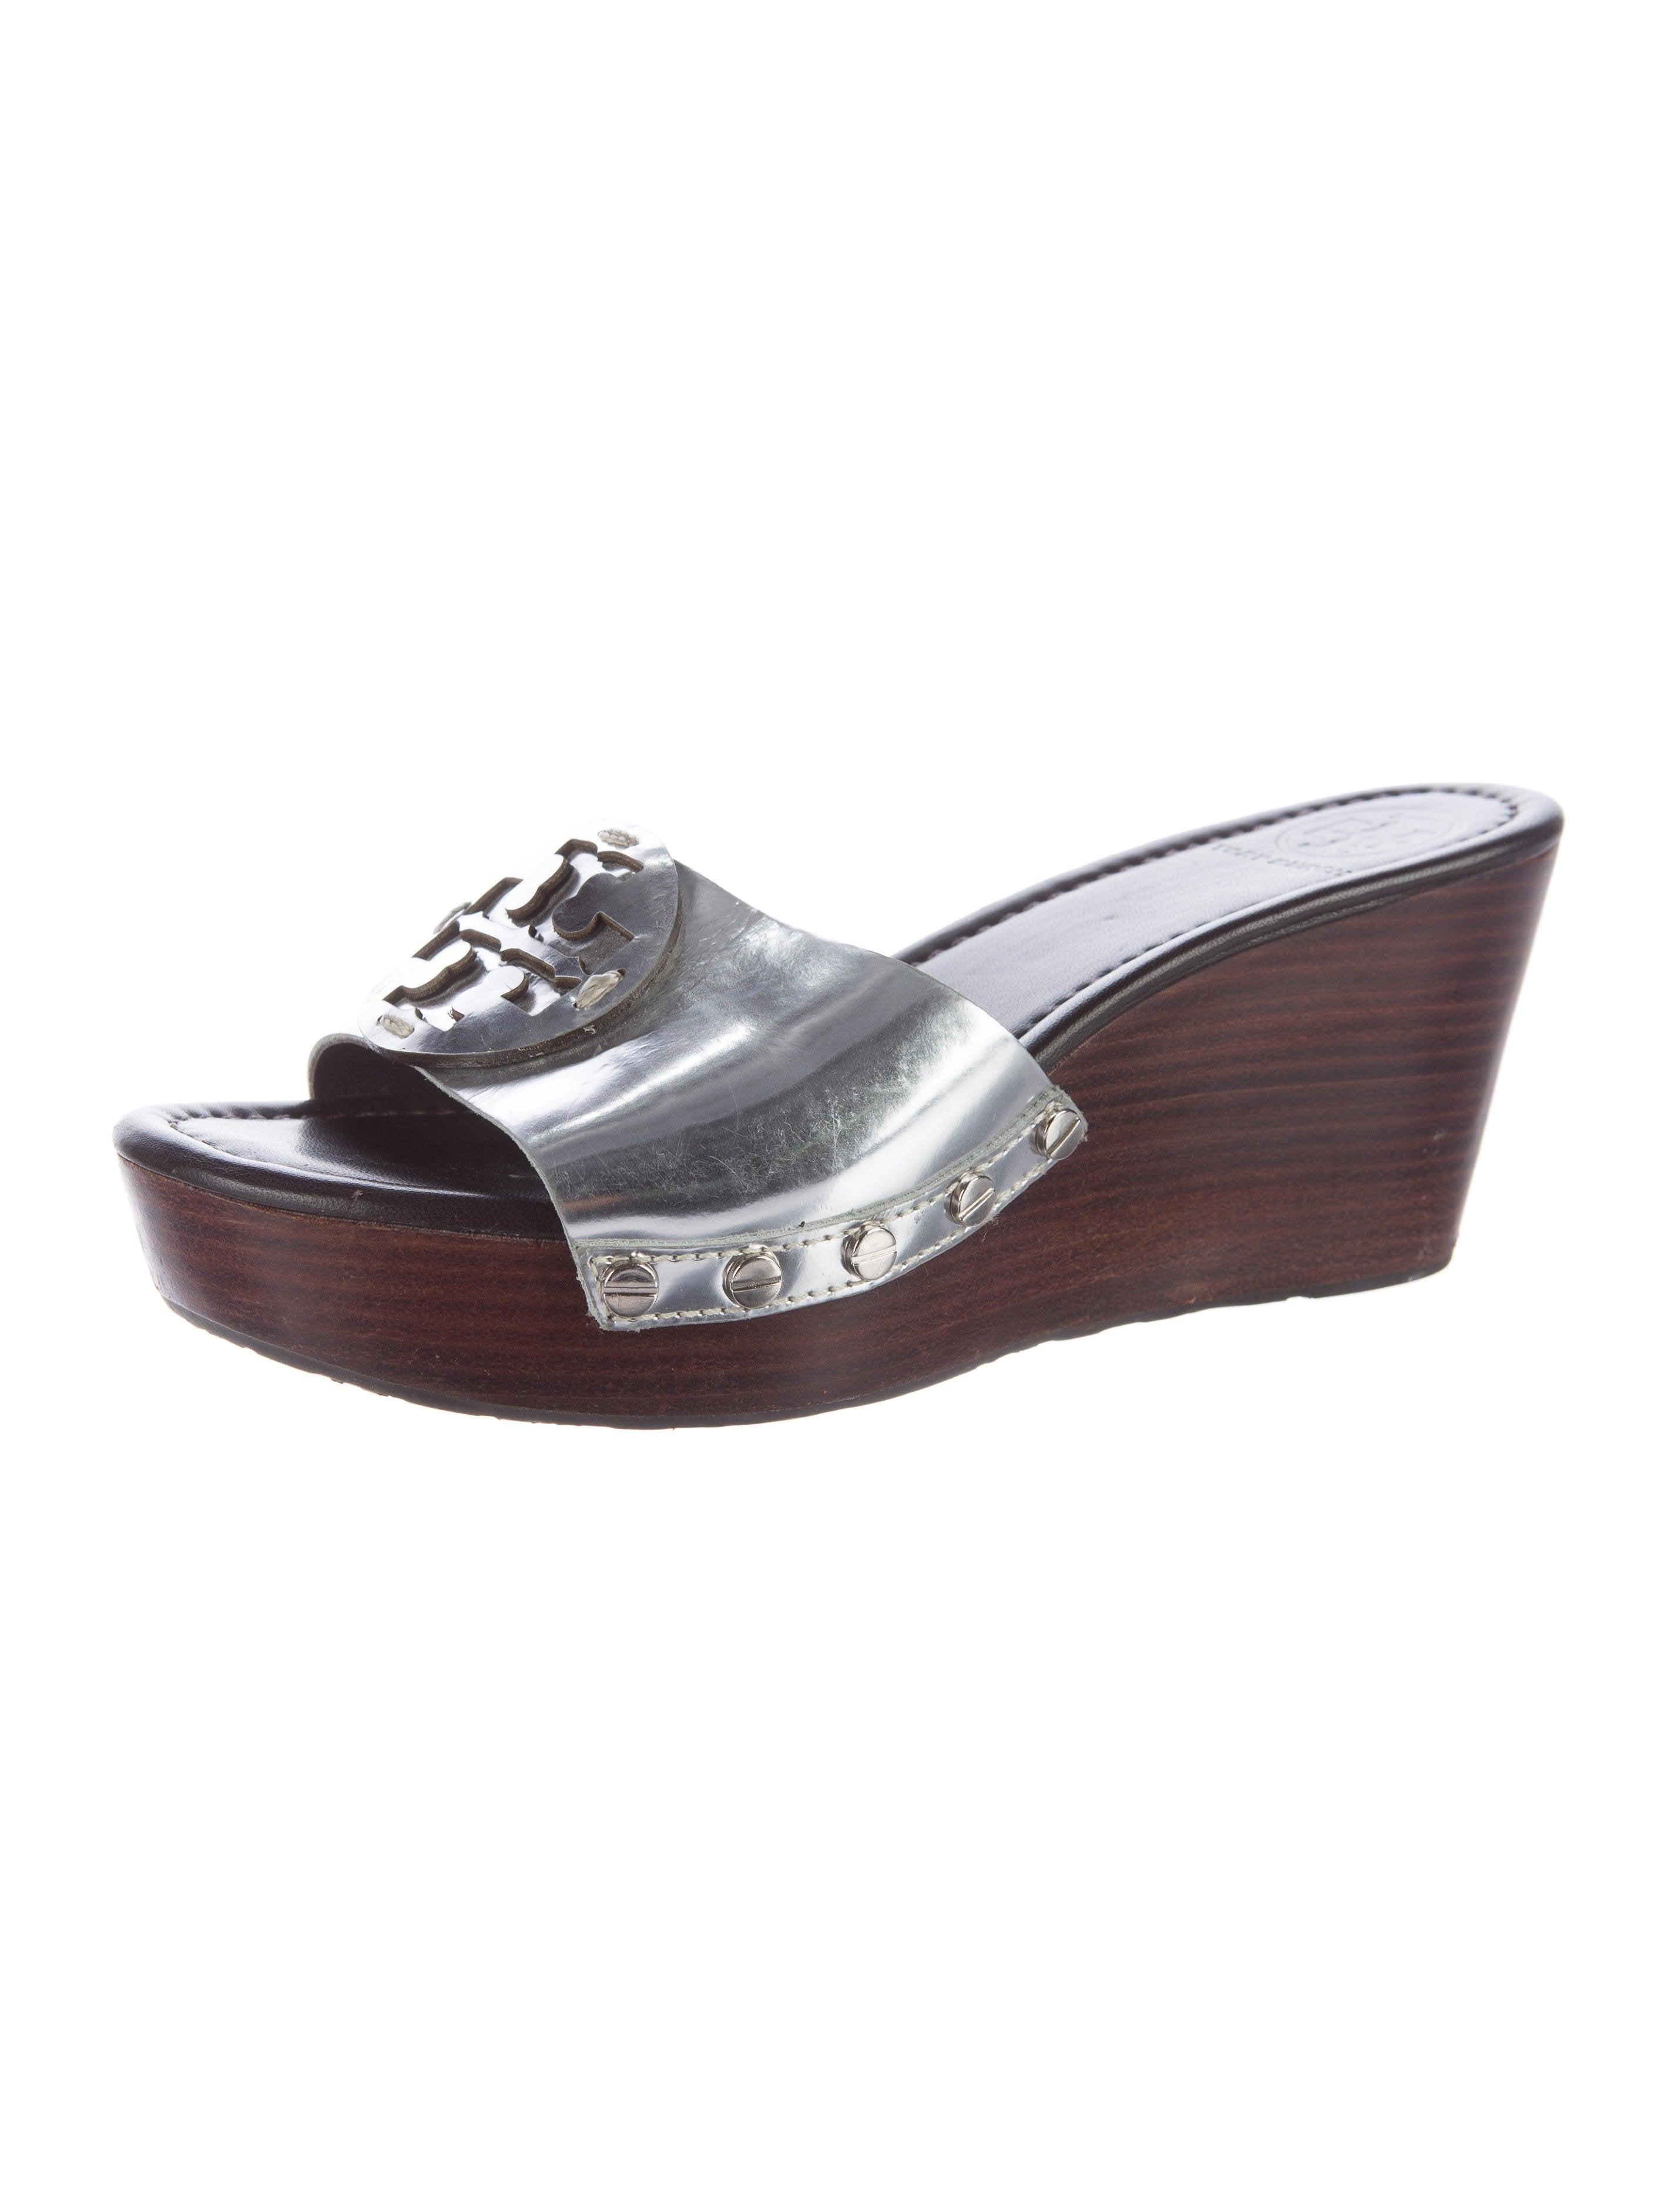 burch metallic wedge sandals shoes wto104070